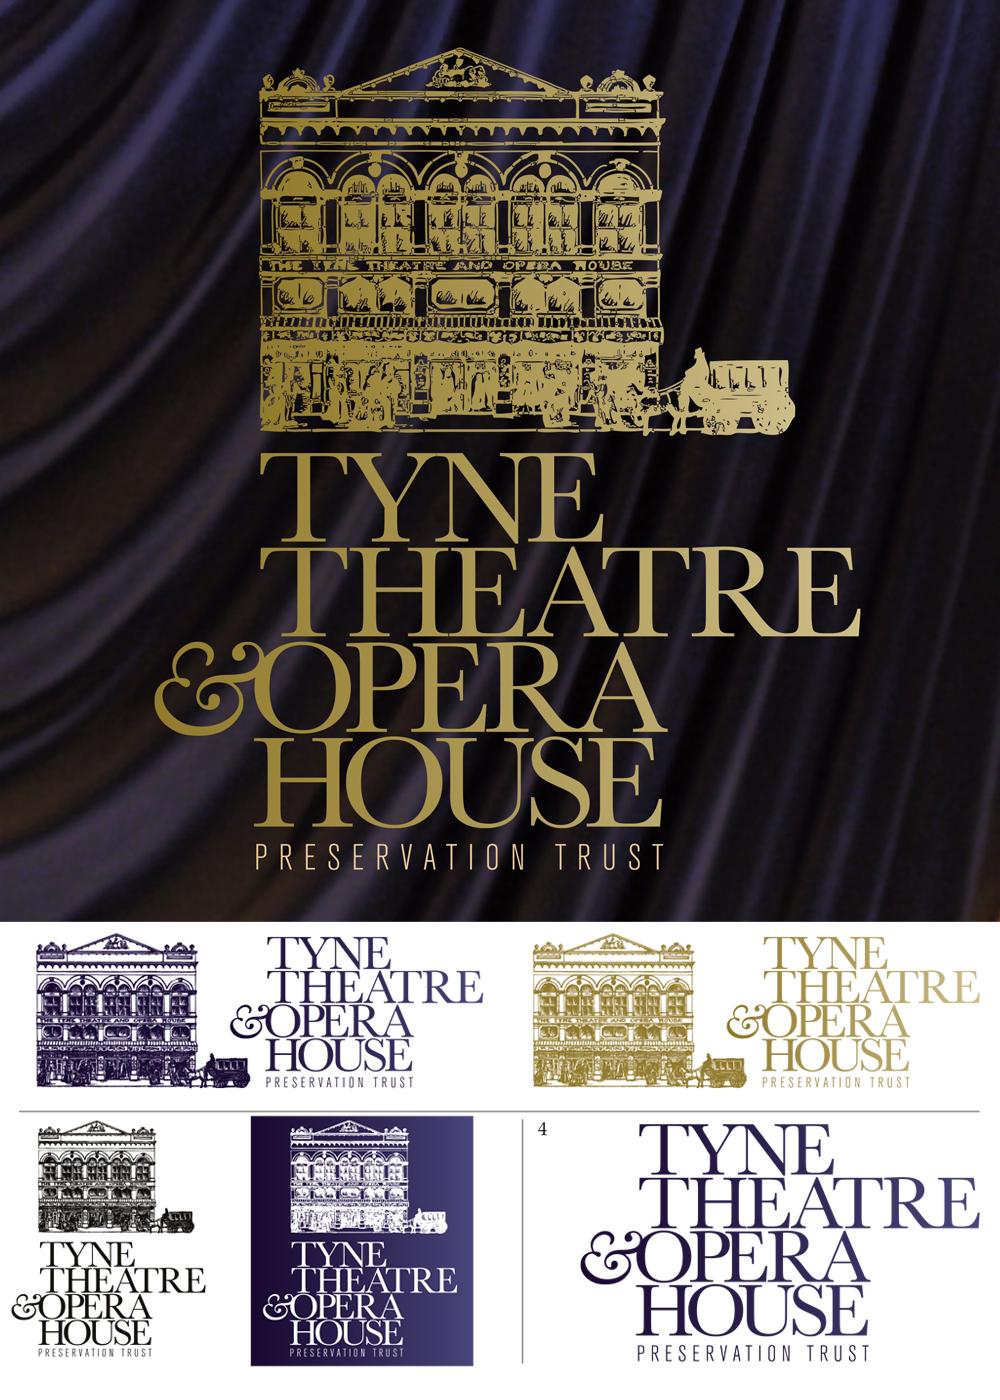 Logo designs for Tyne theatre Opera House